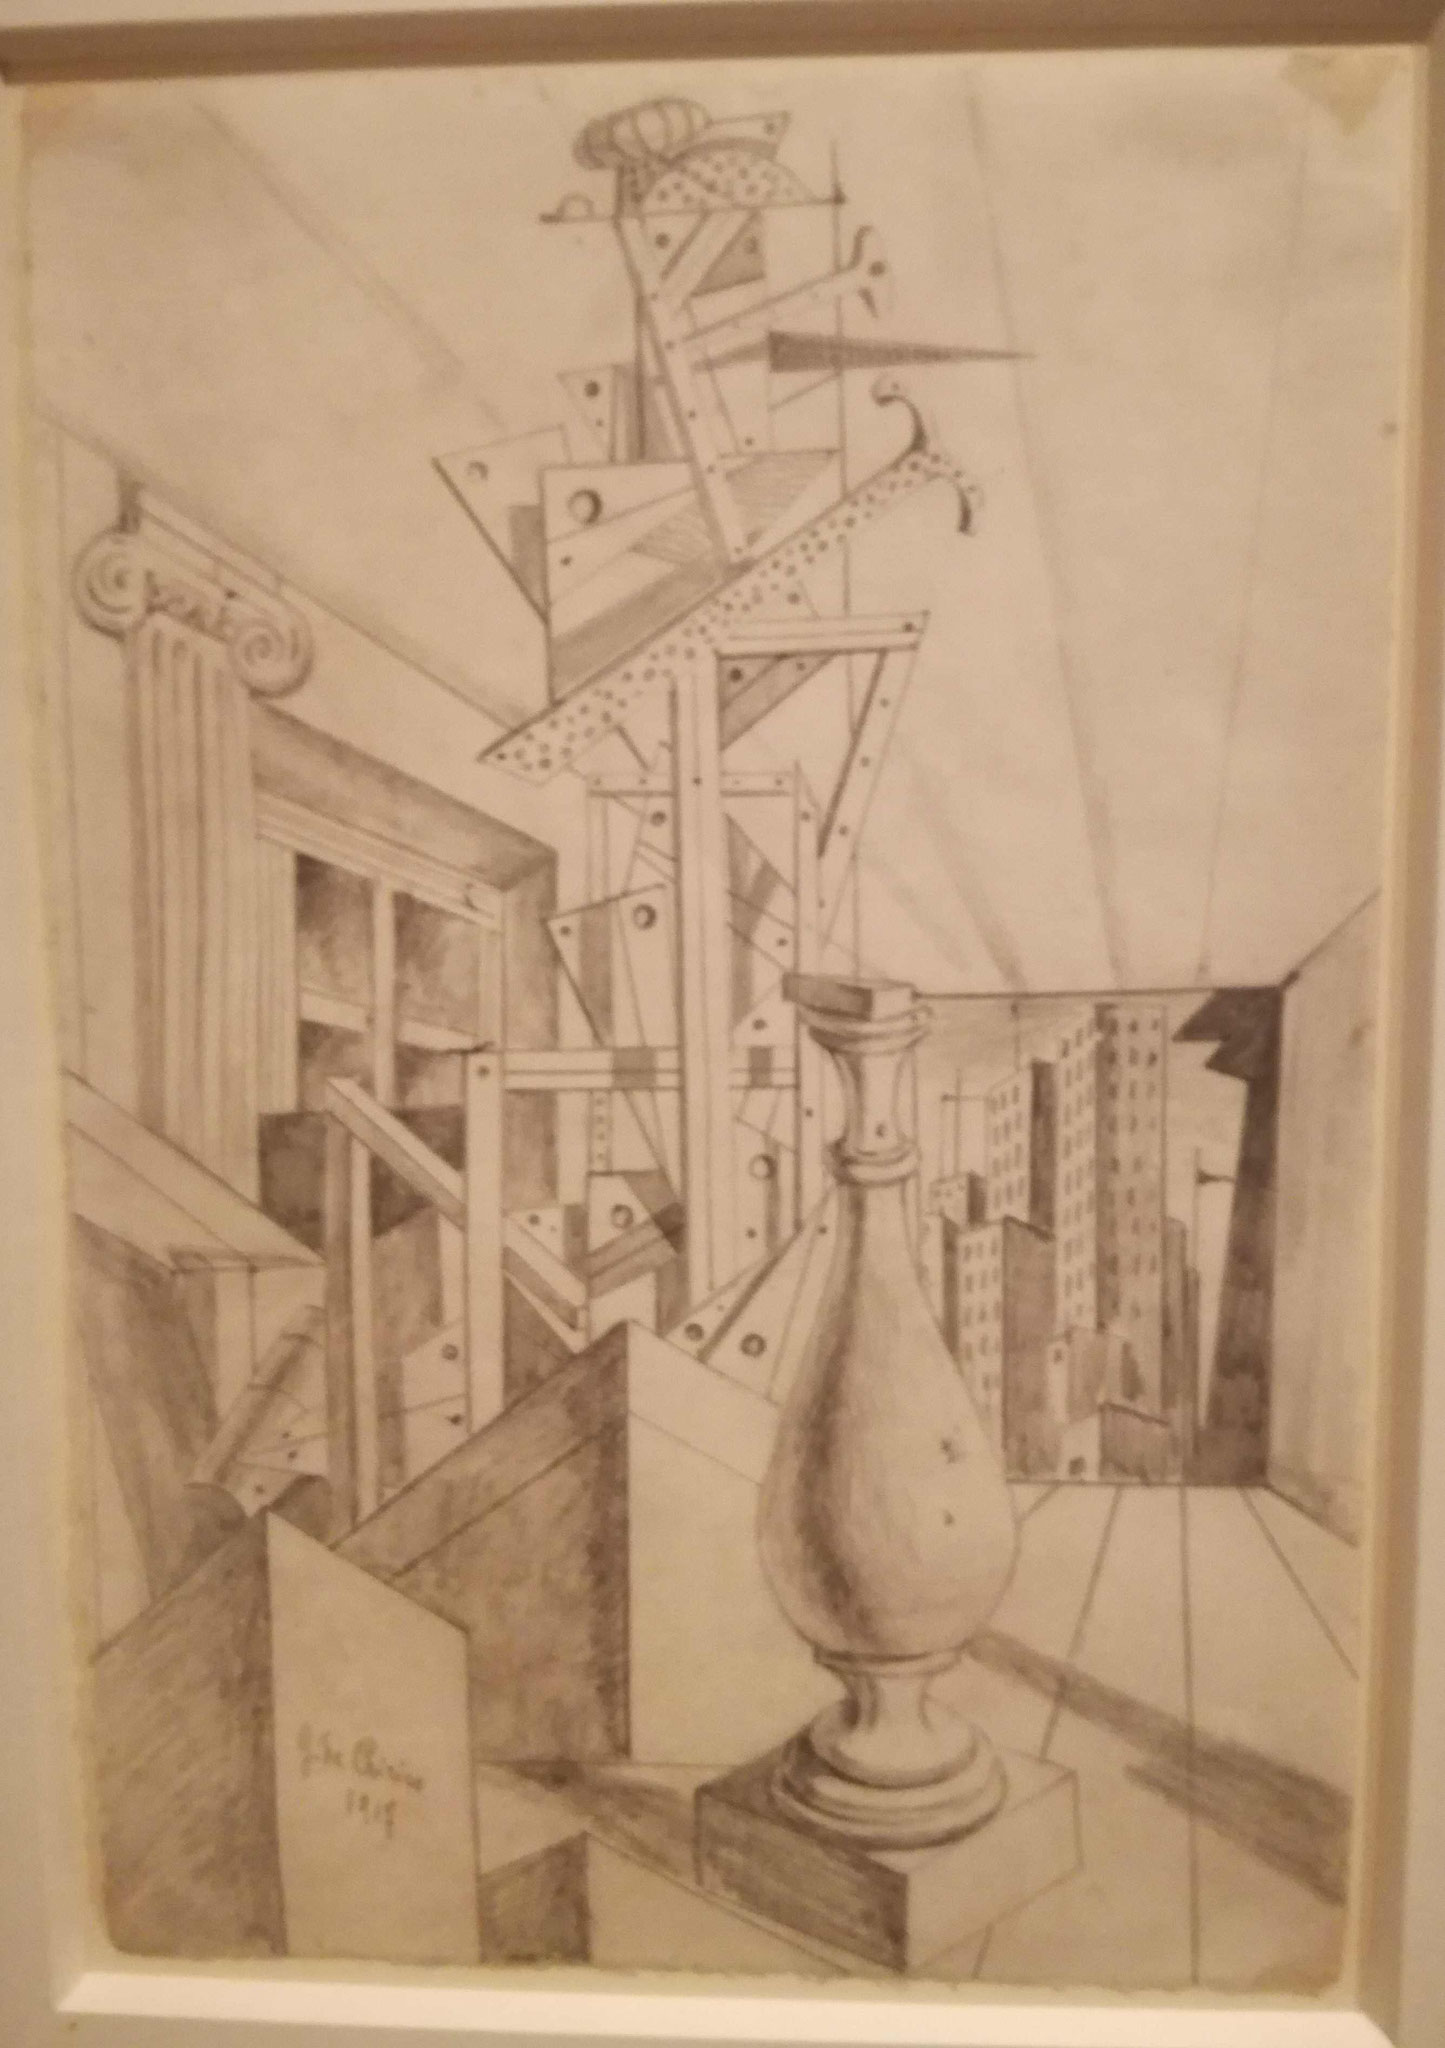 Giorgio de Chirico, Sammlung Scharf-Gerstenberg, Nationalgalerie Berlin